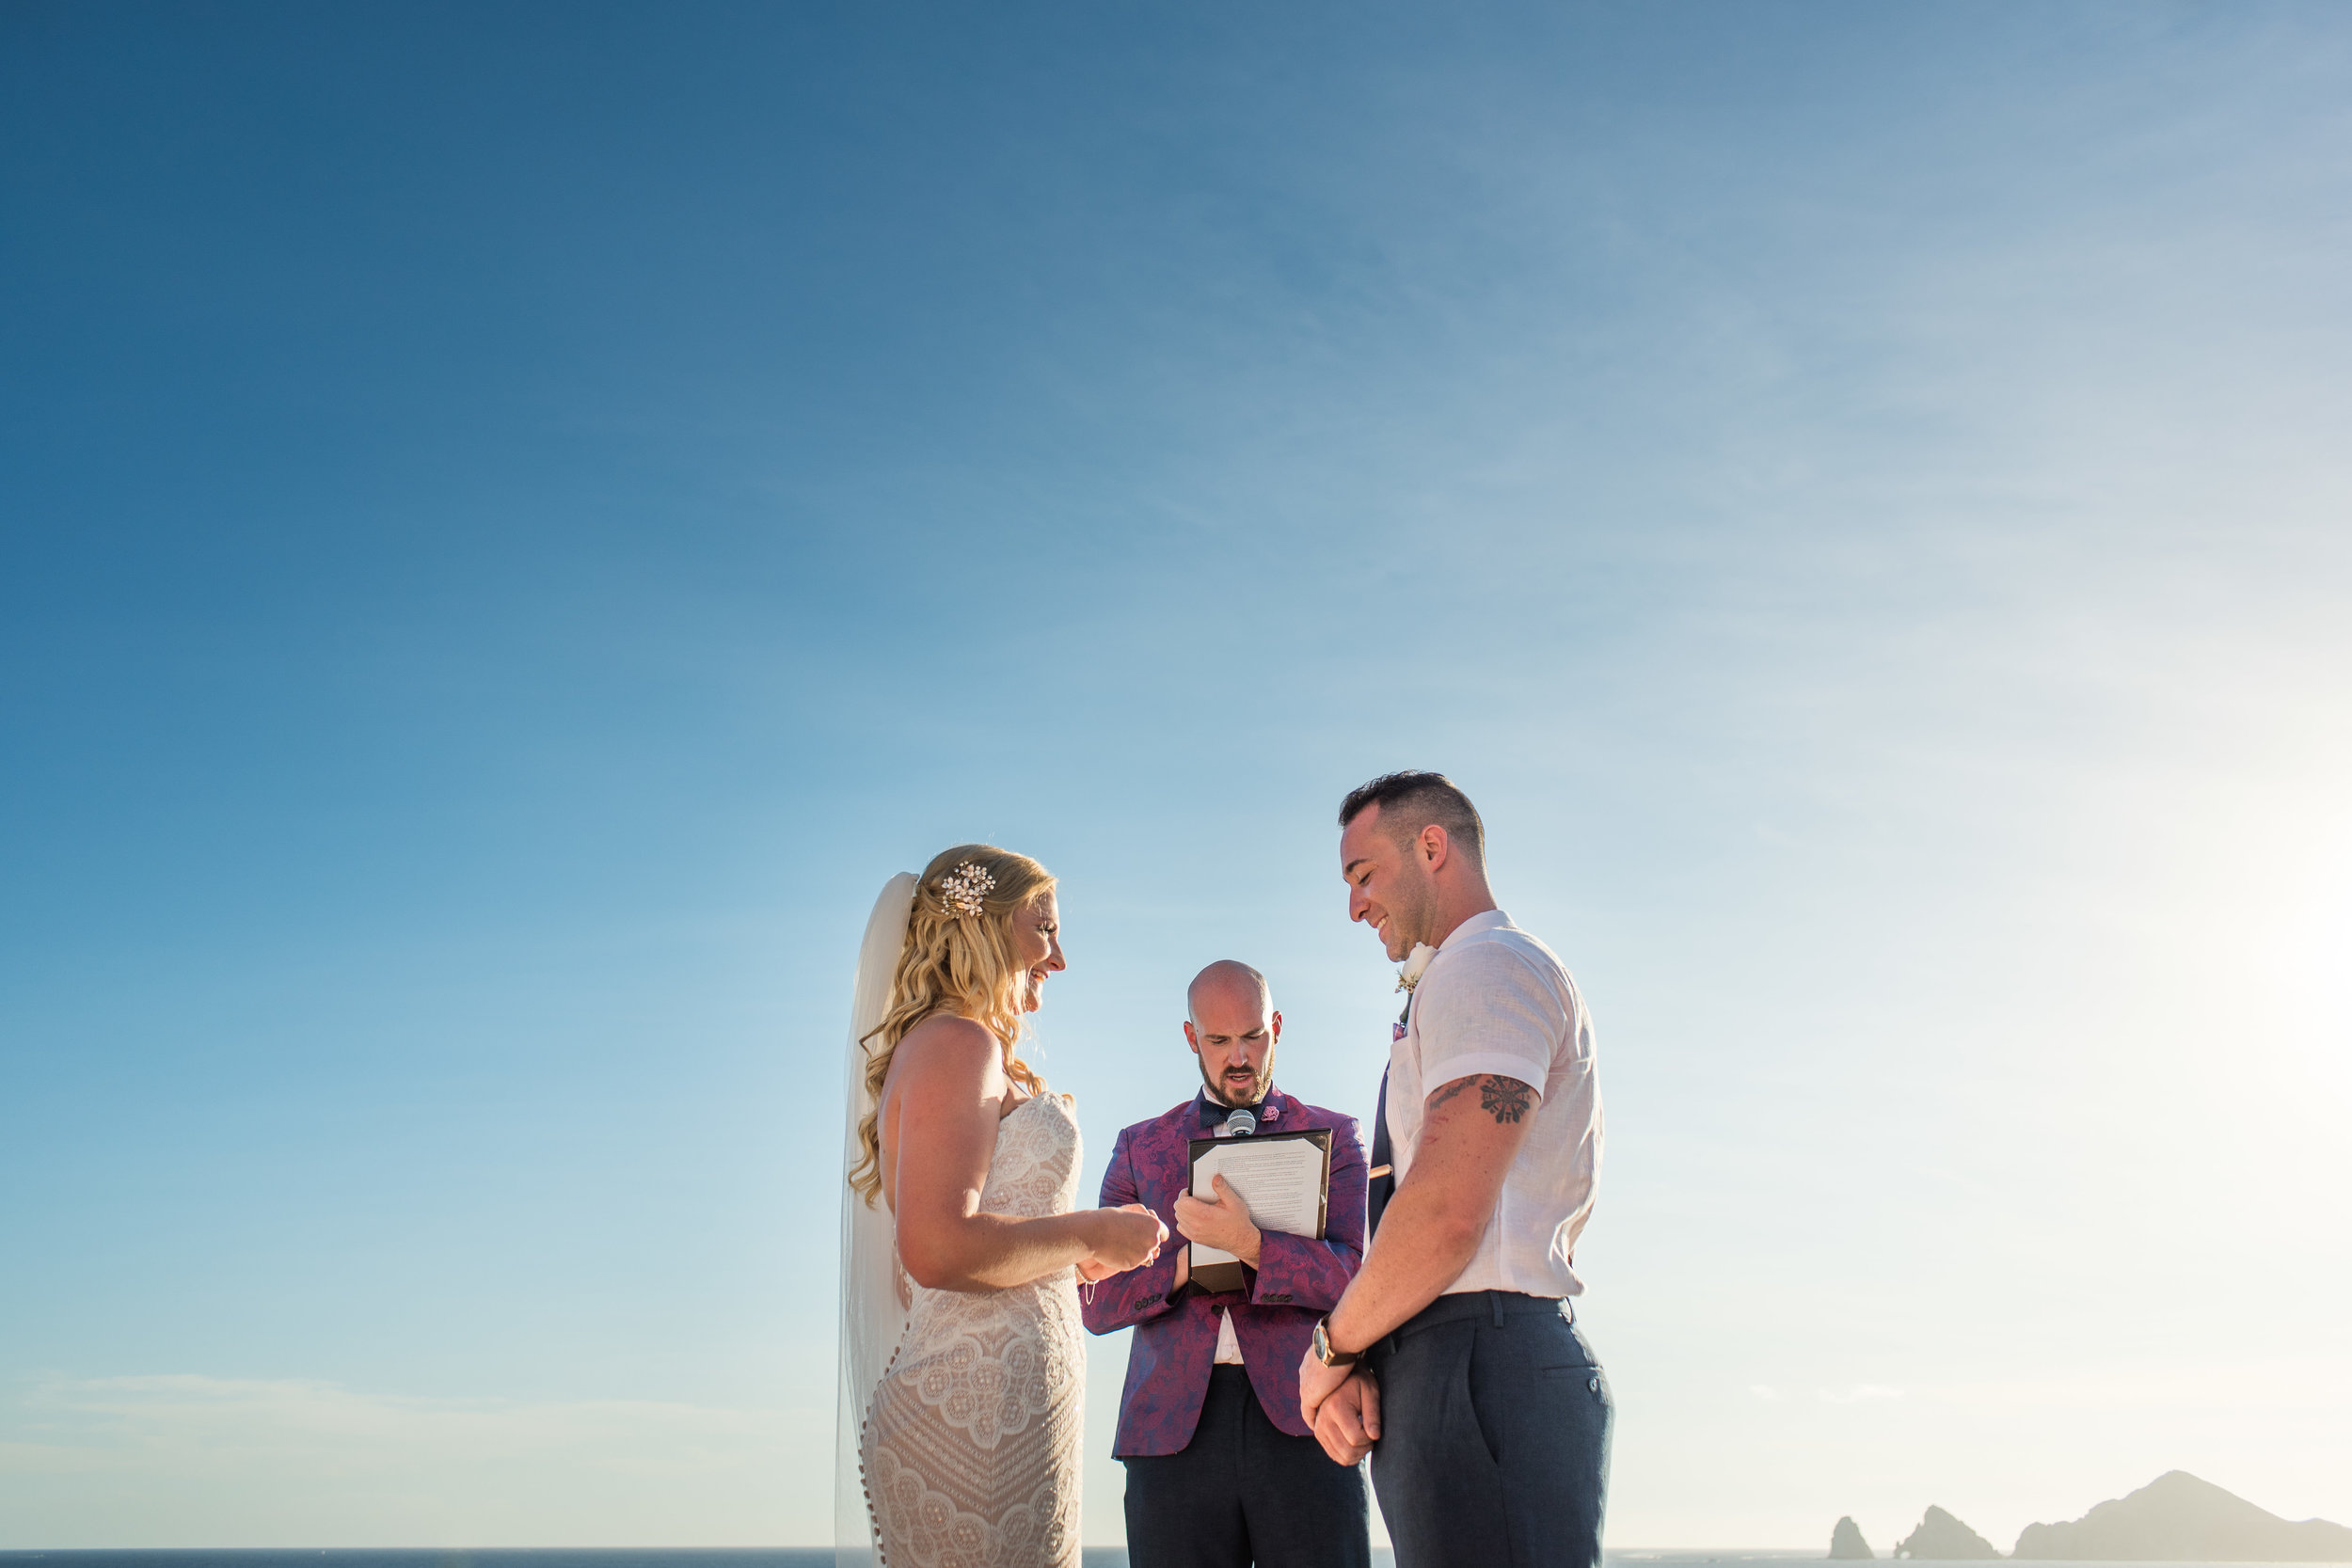 SUNSET-MONALISA-WEDDING-VENUE